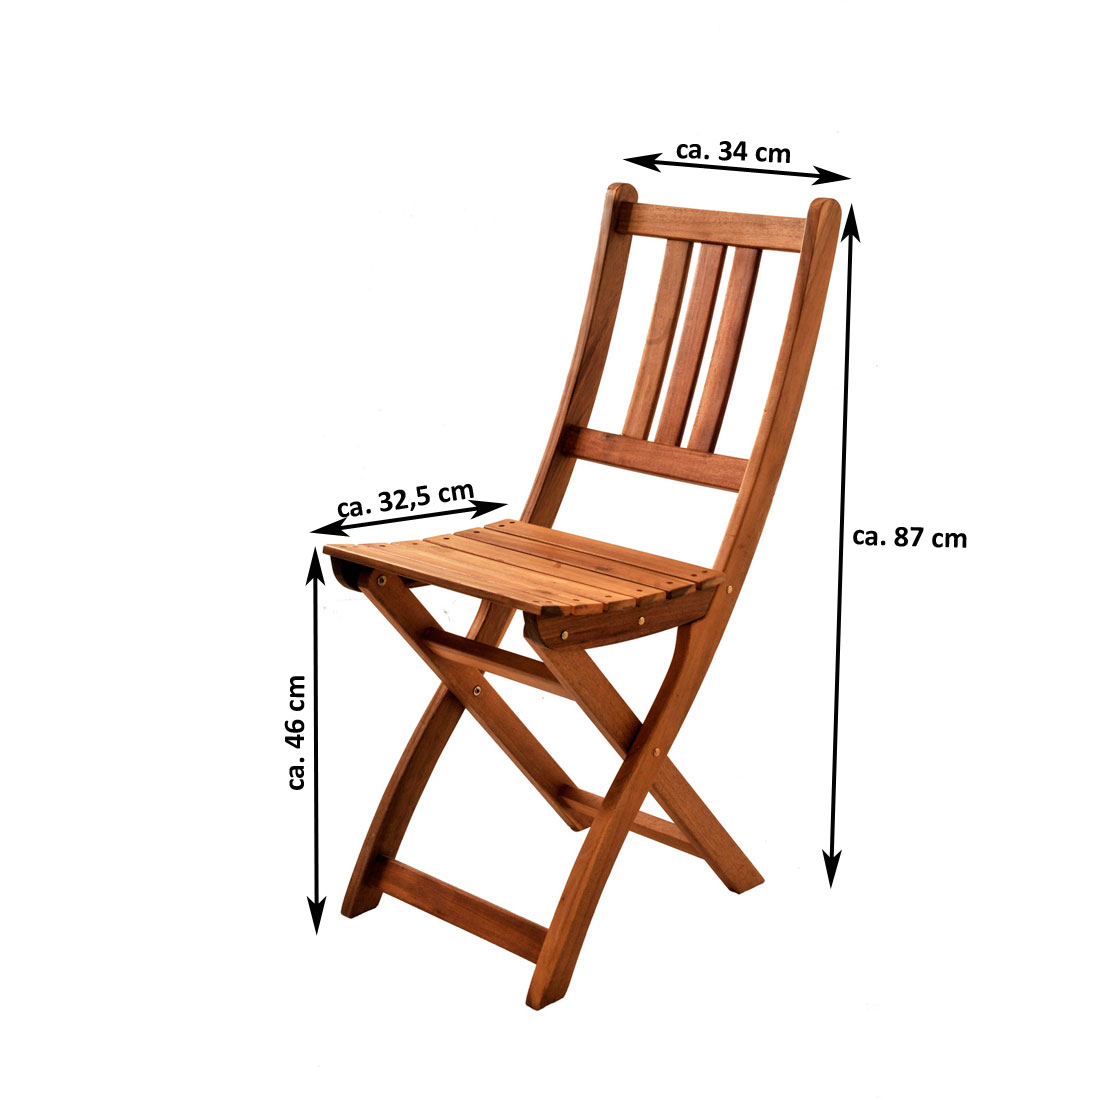 SAM® Gartenmöbel Set 4tlg Akazienholz Balkontisch 80x60 cm SKARA